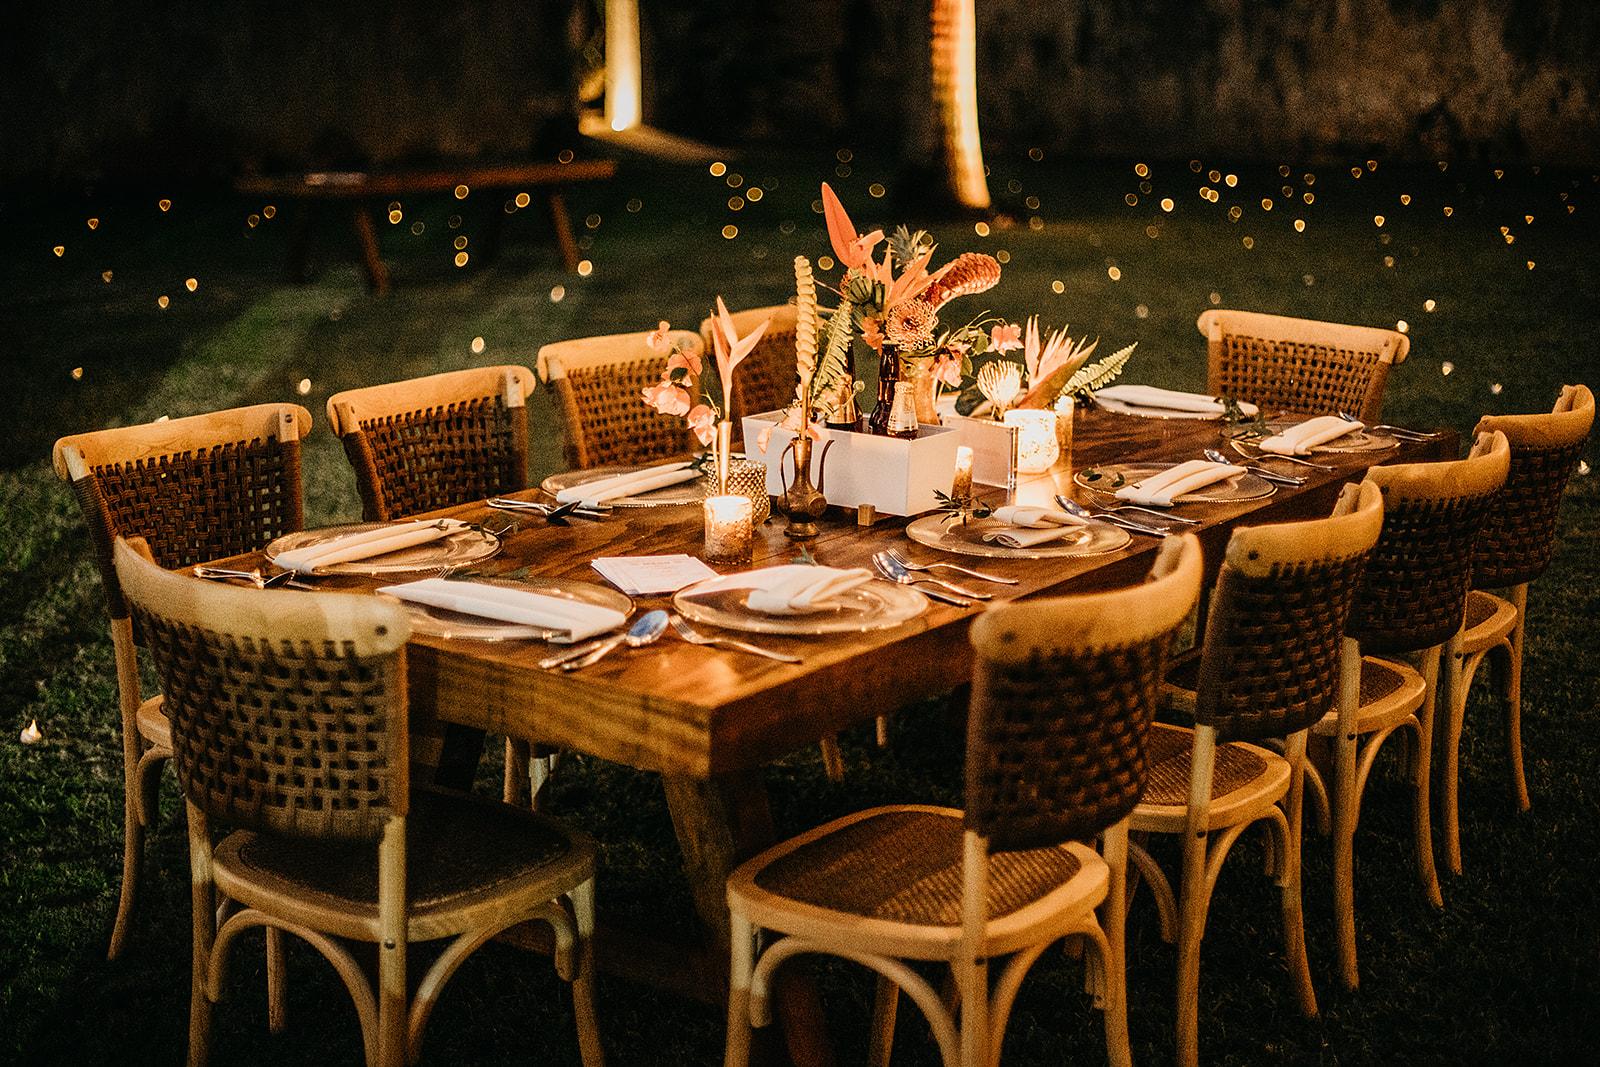 AmandaMarkus-Hacienda-Sac-Chich-Merida-Wedding-650_websize.jpg